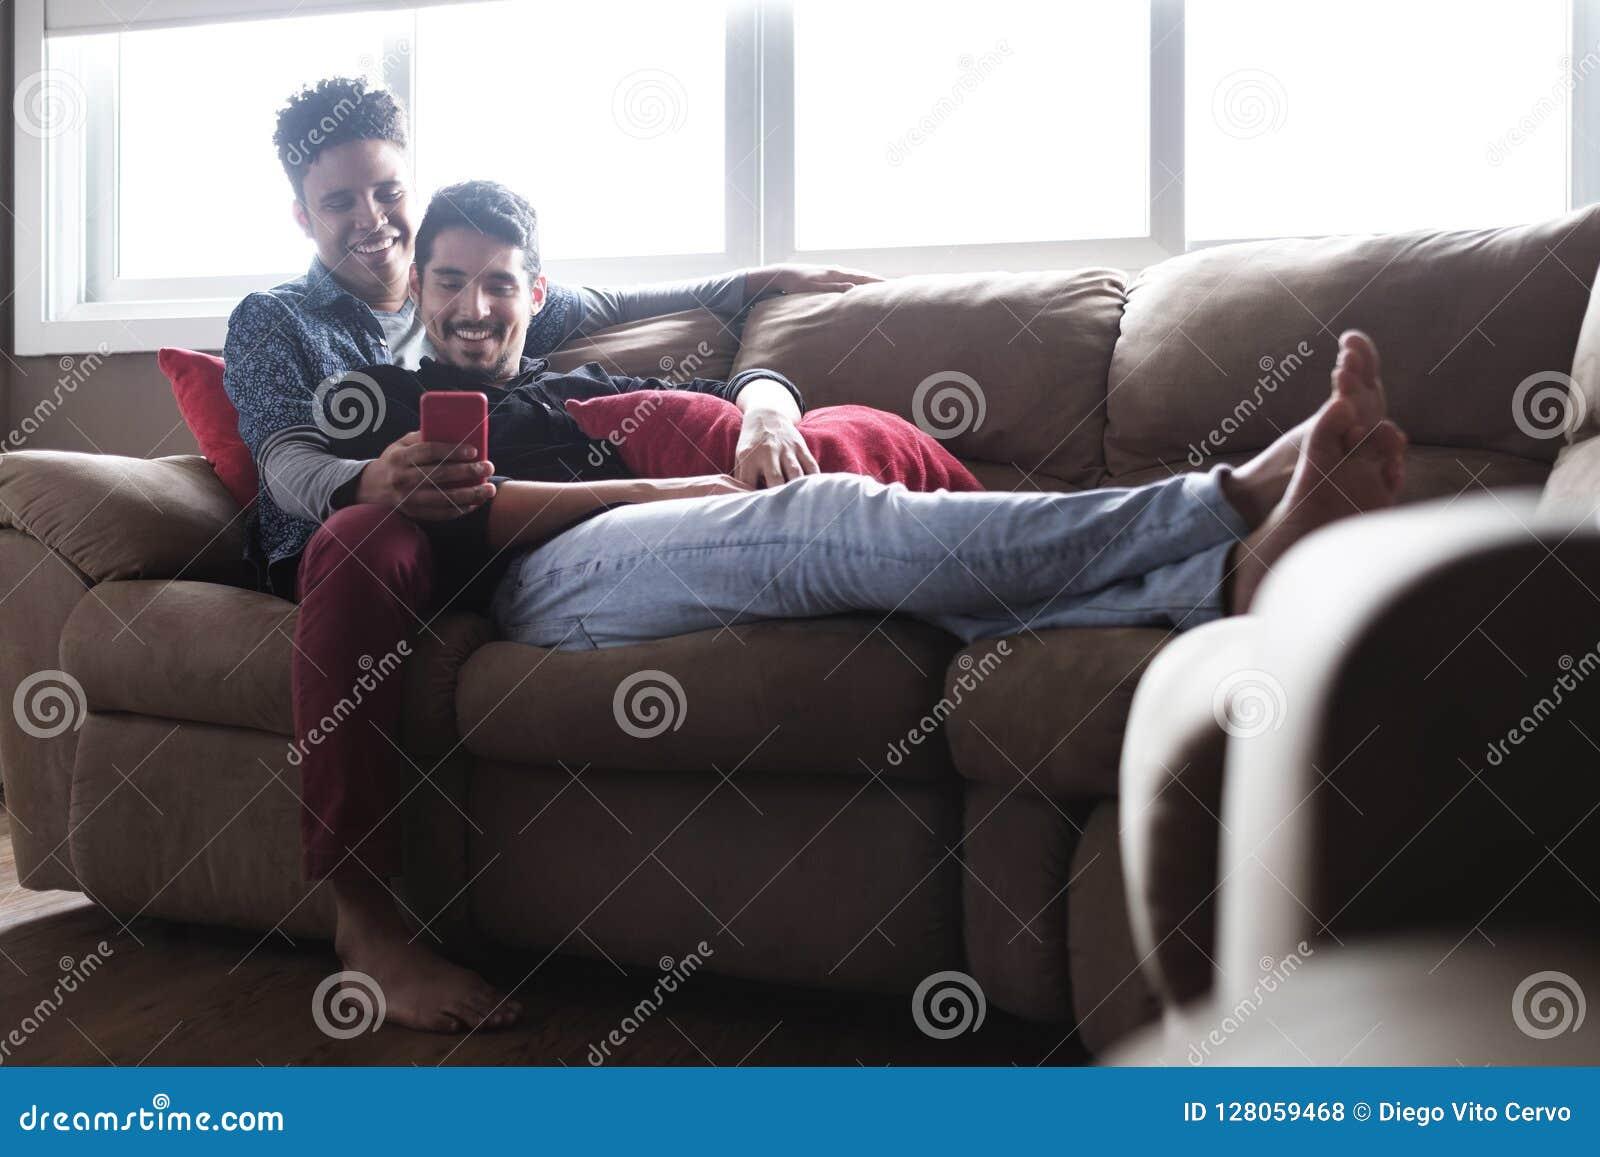 Schwule Sex-Ppics com